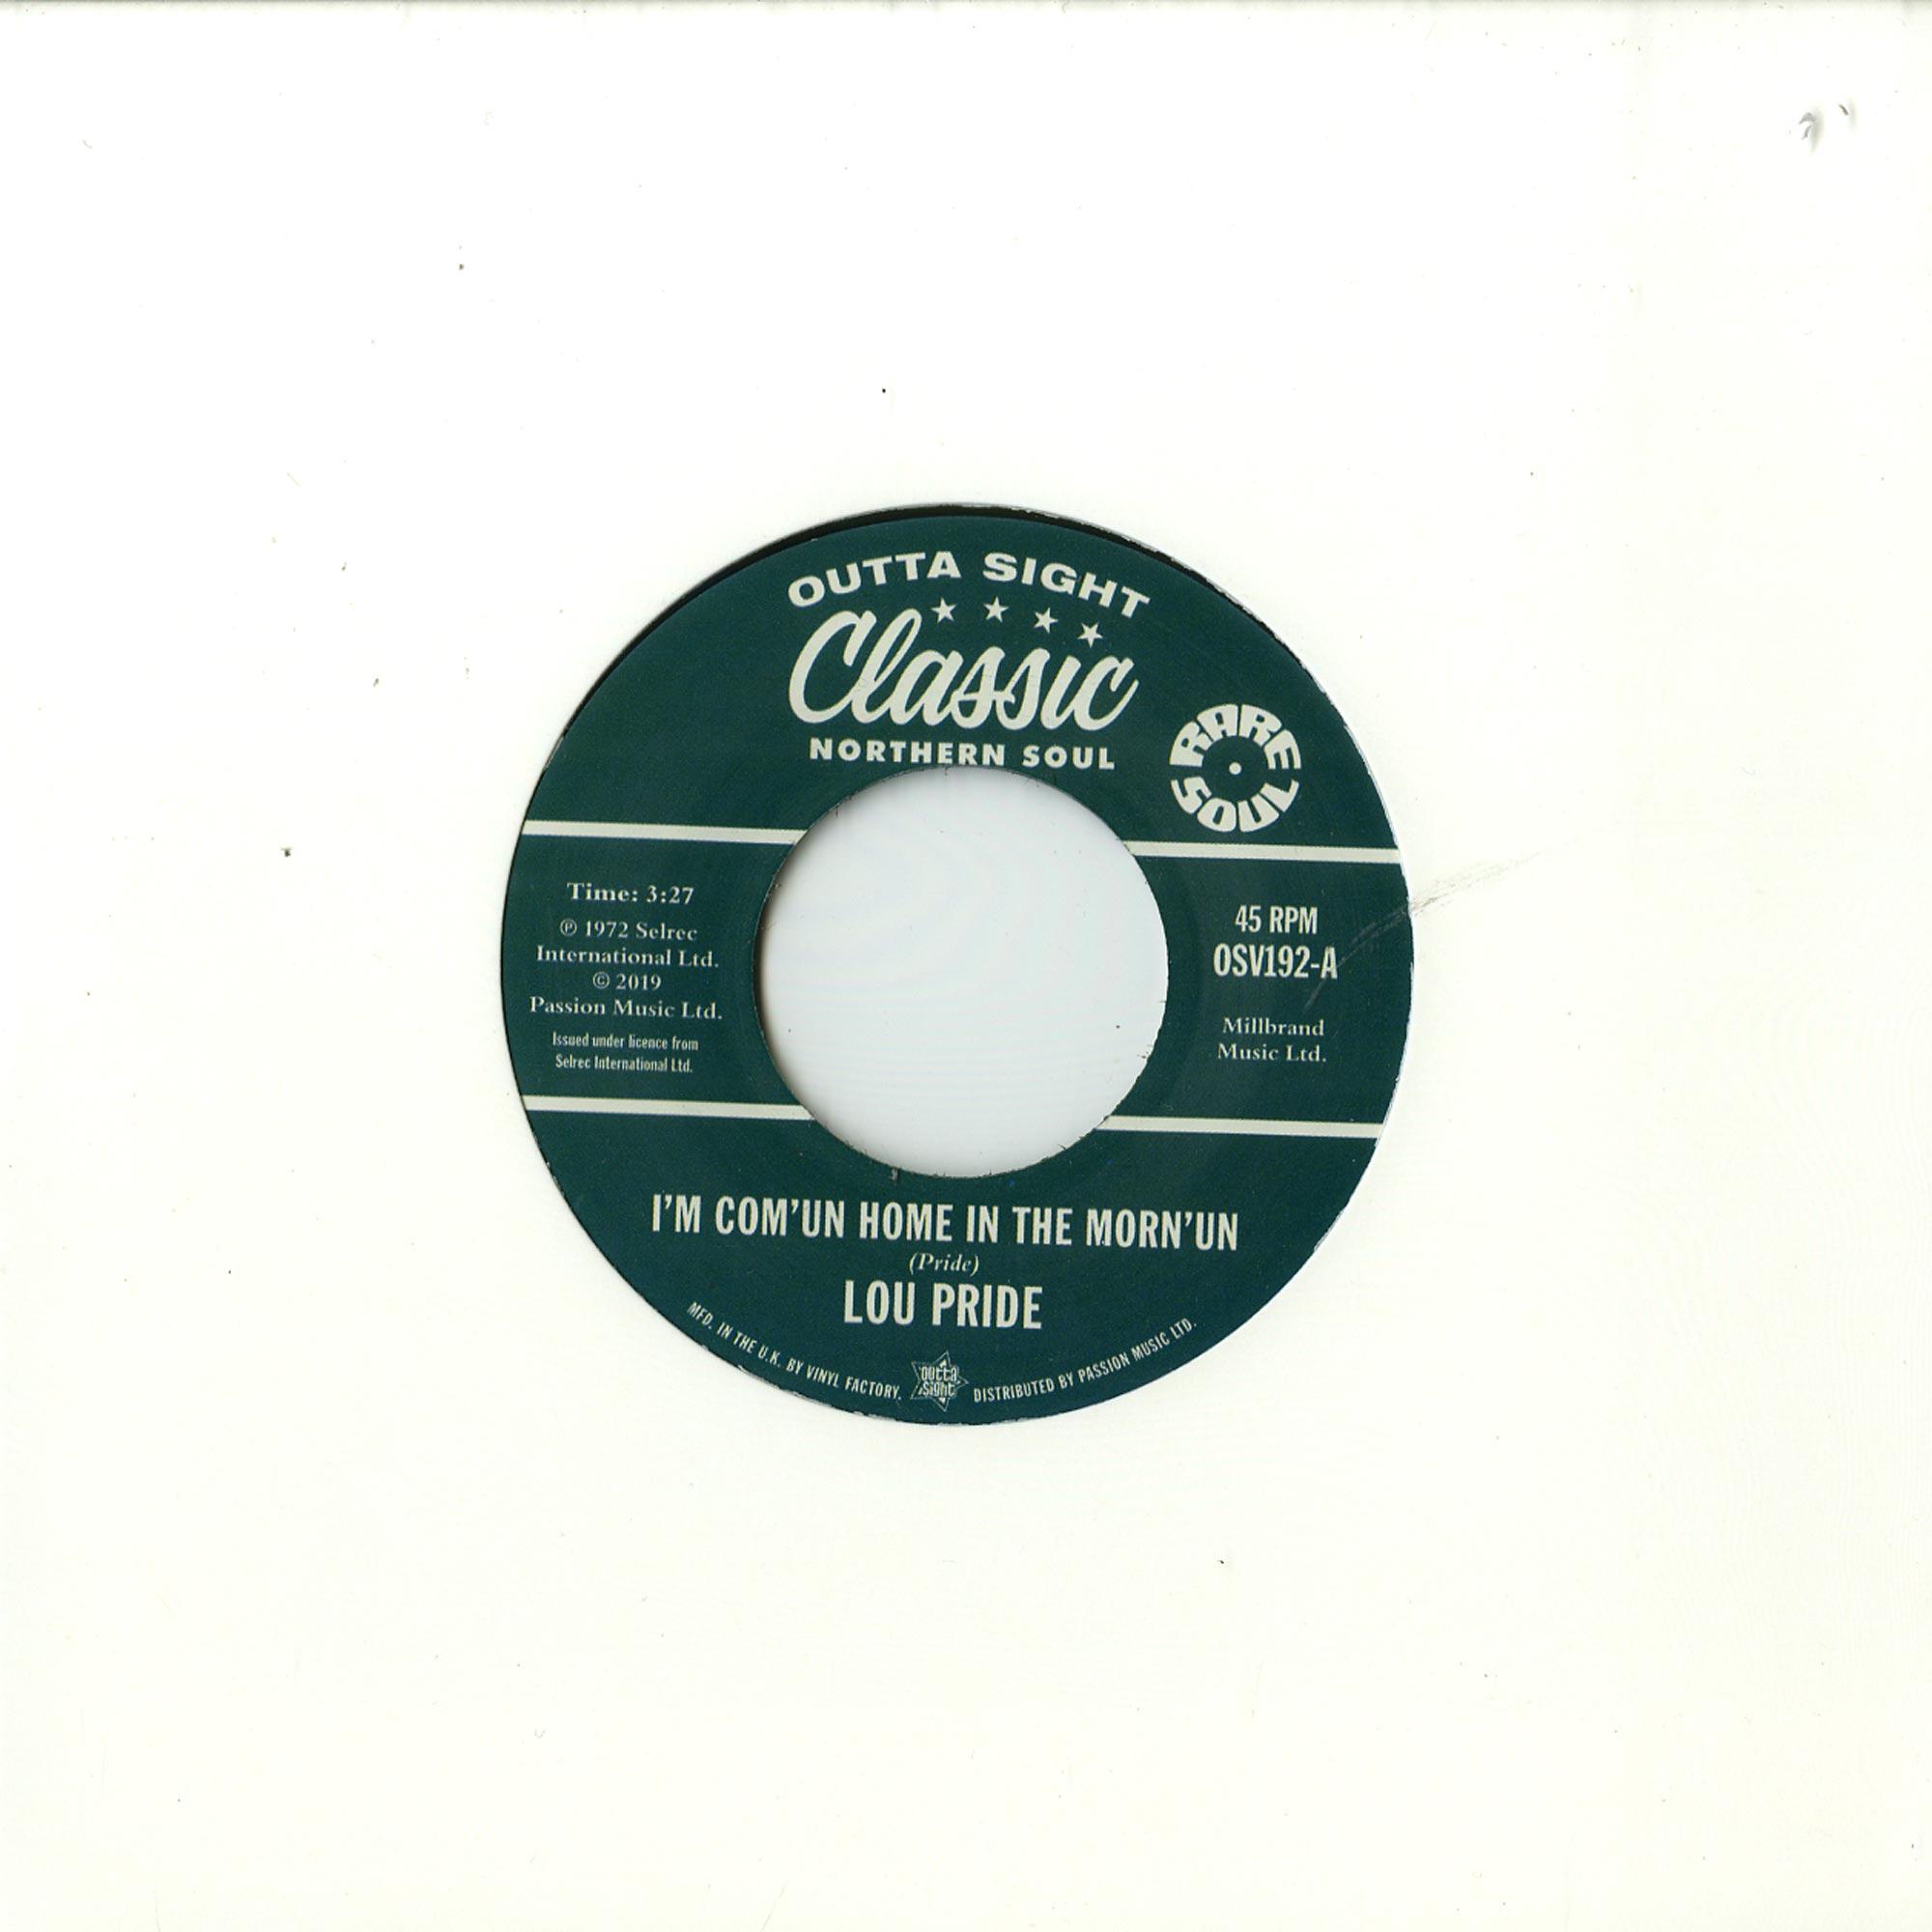 Lou Pride / Don Varner - I M COMUN HOME IN THE MORNUN / TEARSTAINED FACE